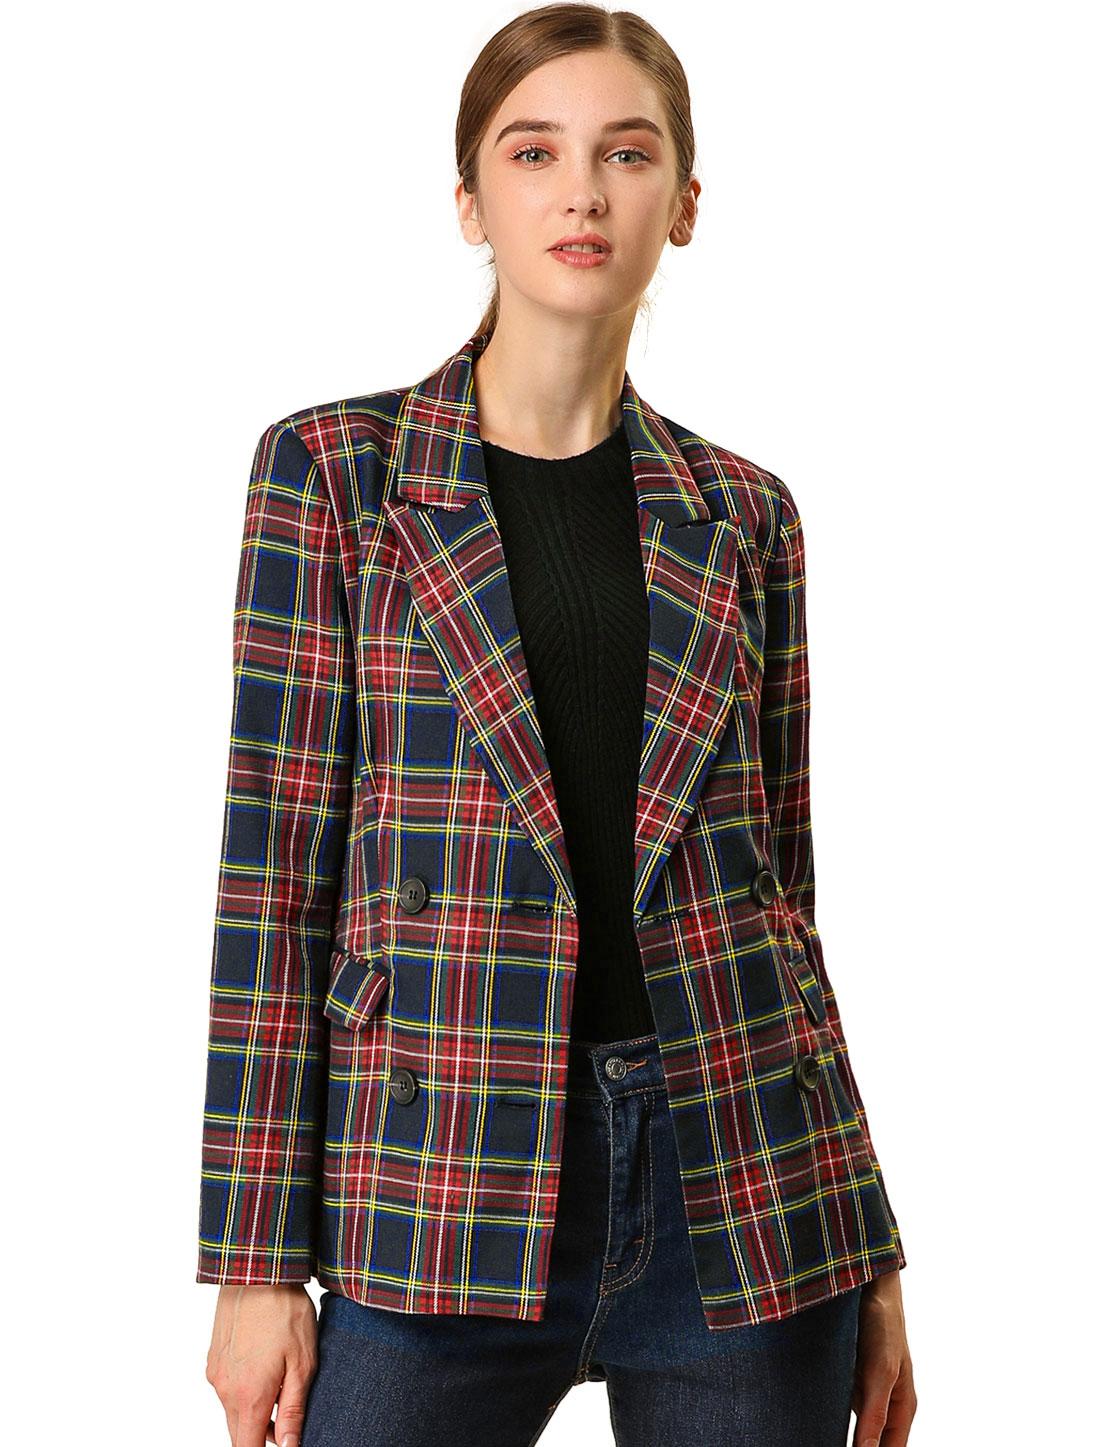 Allegra K Women Double Breasted Plaid Formal Blazer Jacket Dark Blue L